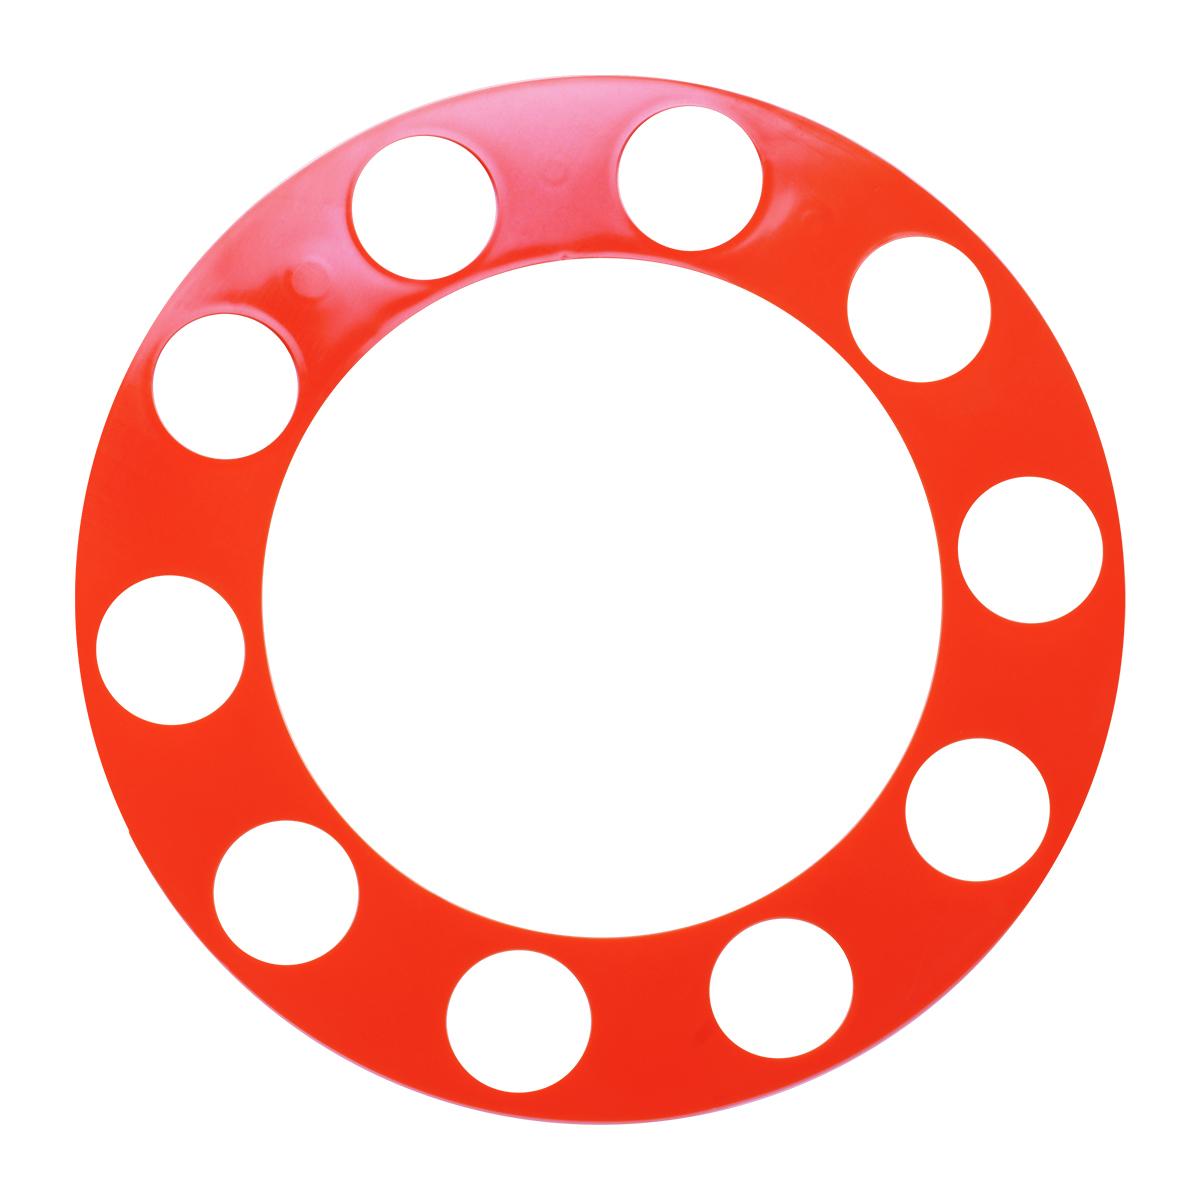 Orange Rim Protector with 10 Ring Holes